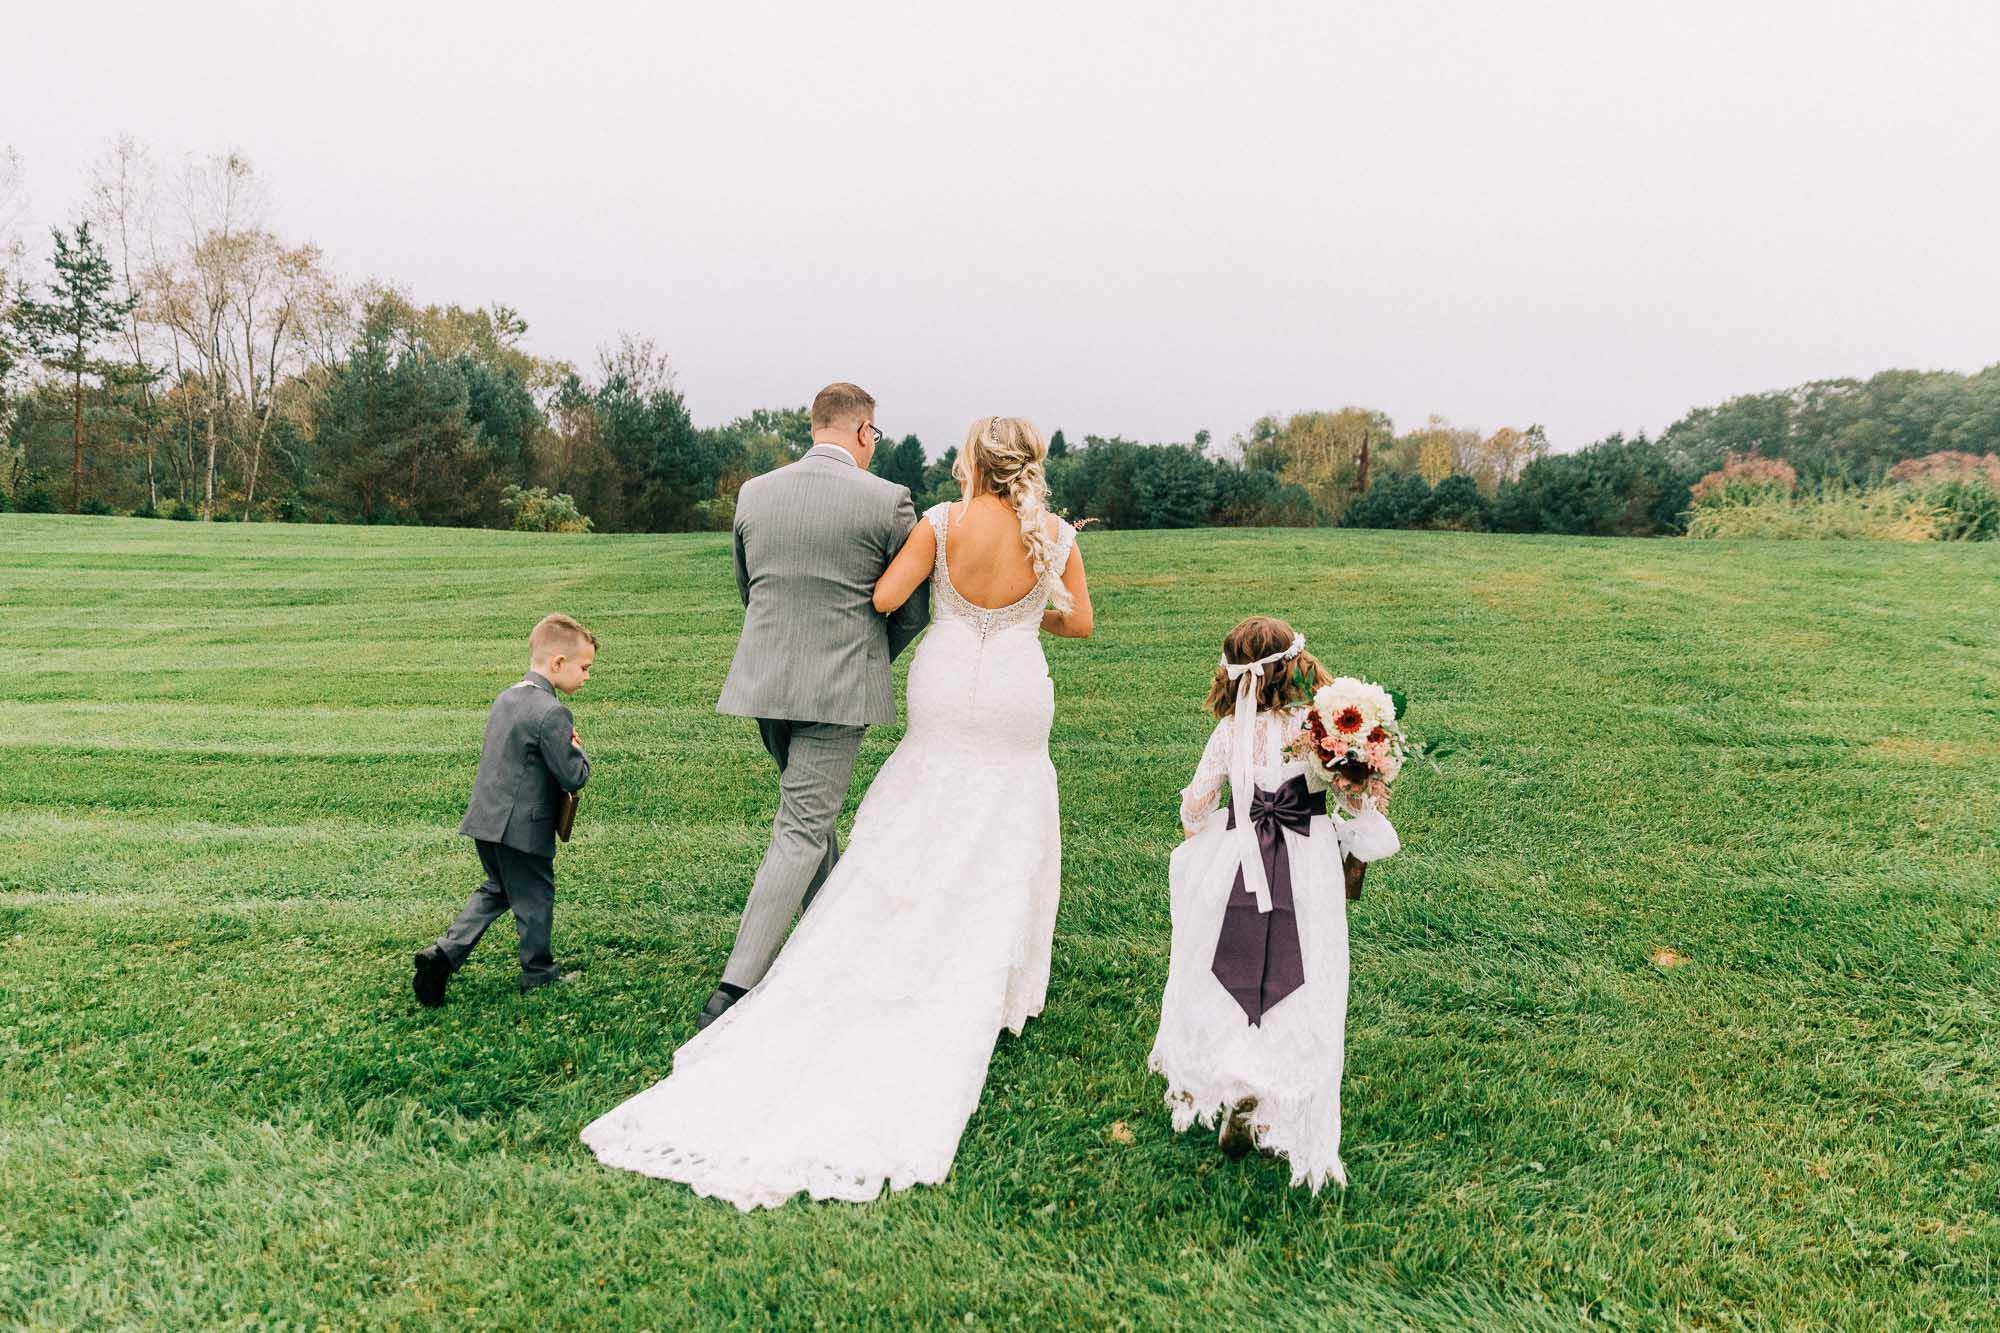 Lodge-at-Raven-Creek-October-wedding-38.jpg